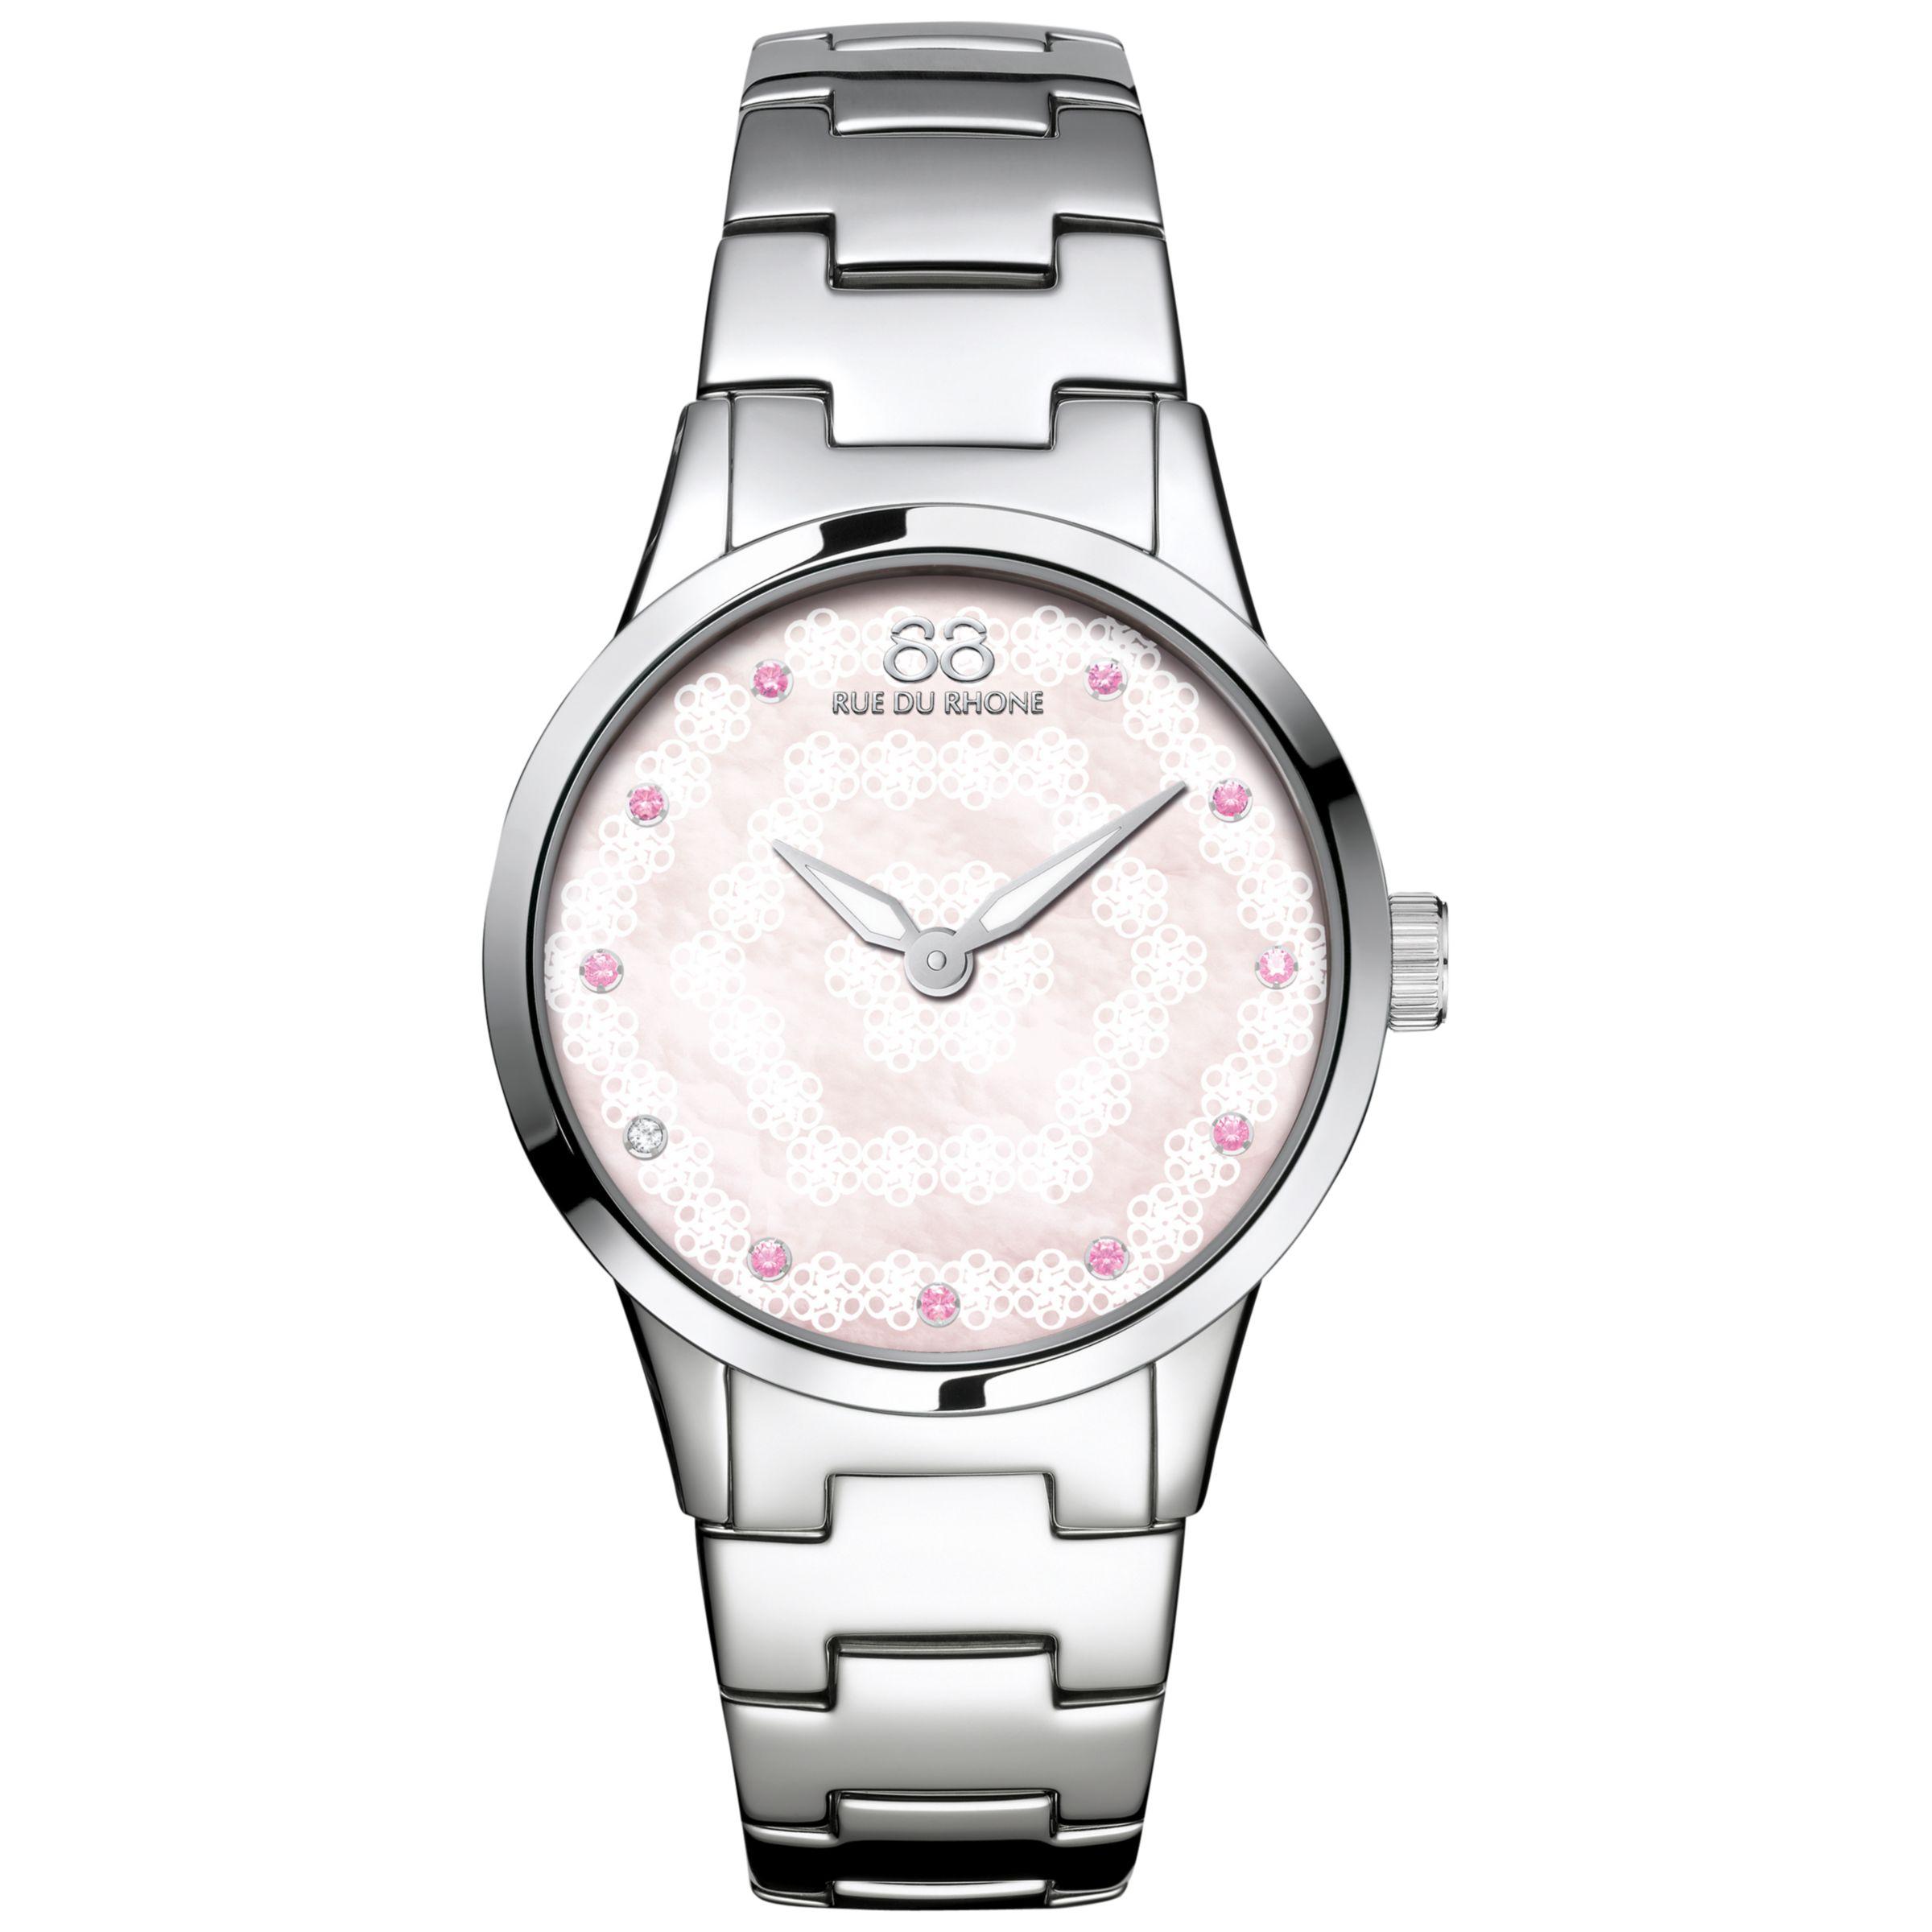 88 Rue Du Rhone 88 Rue Du Rhone 87WA153203 Women's Rive Pink Sapphire and Diamond Filigree Dial Bracelet Strap Watch, Silver/Mother of Pearl